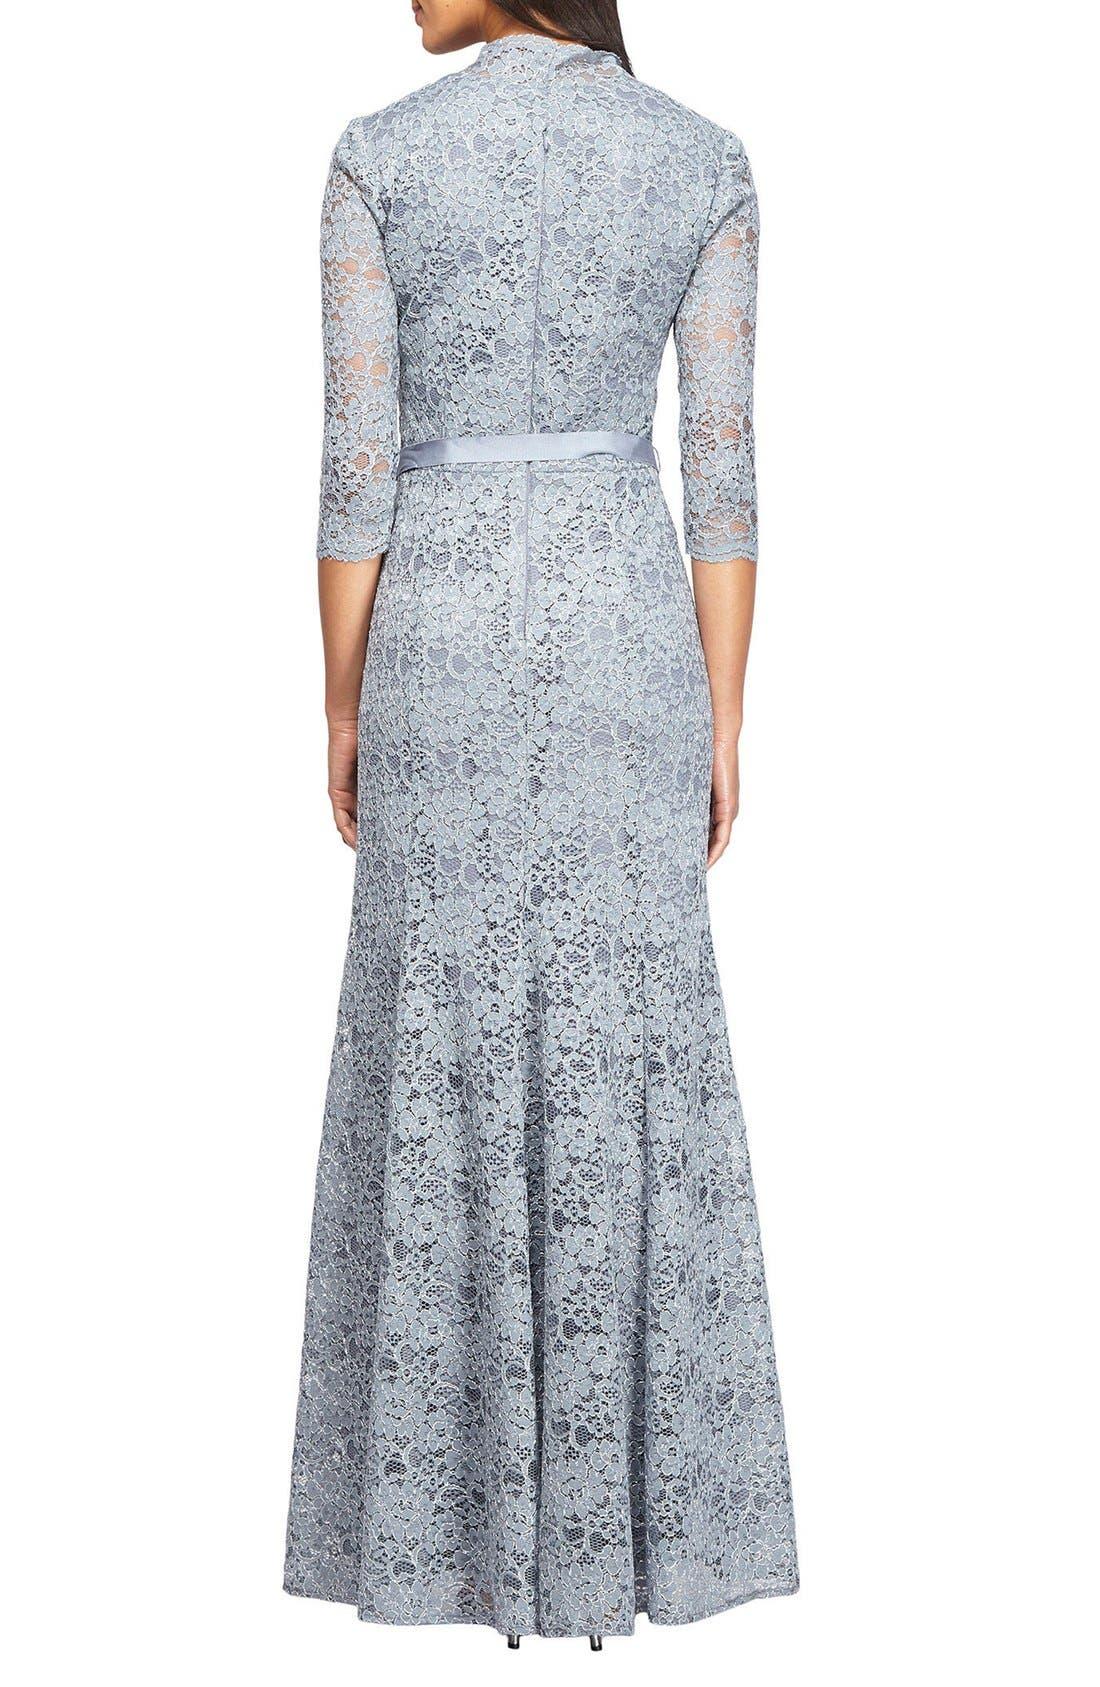 Alternate Image 2  - Alex Evenings Metallic Lace Fit & Flare Gown (Regular & Petite)